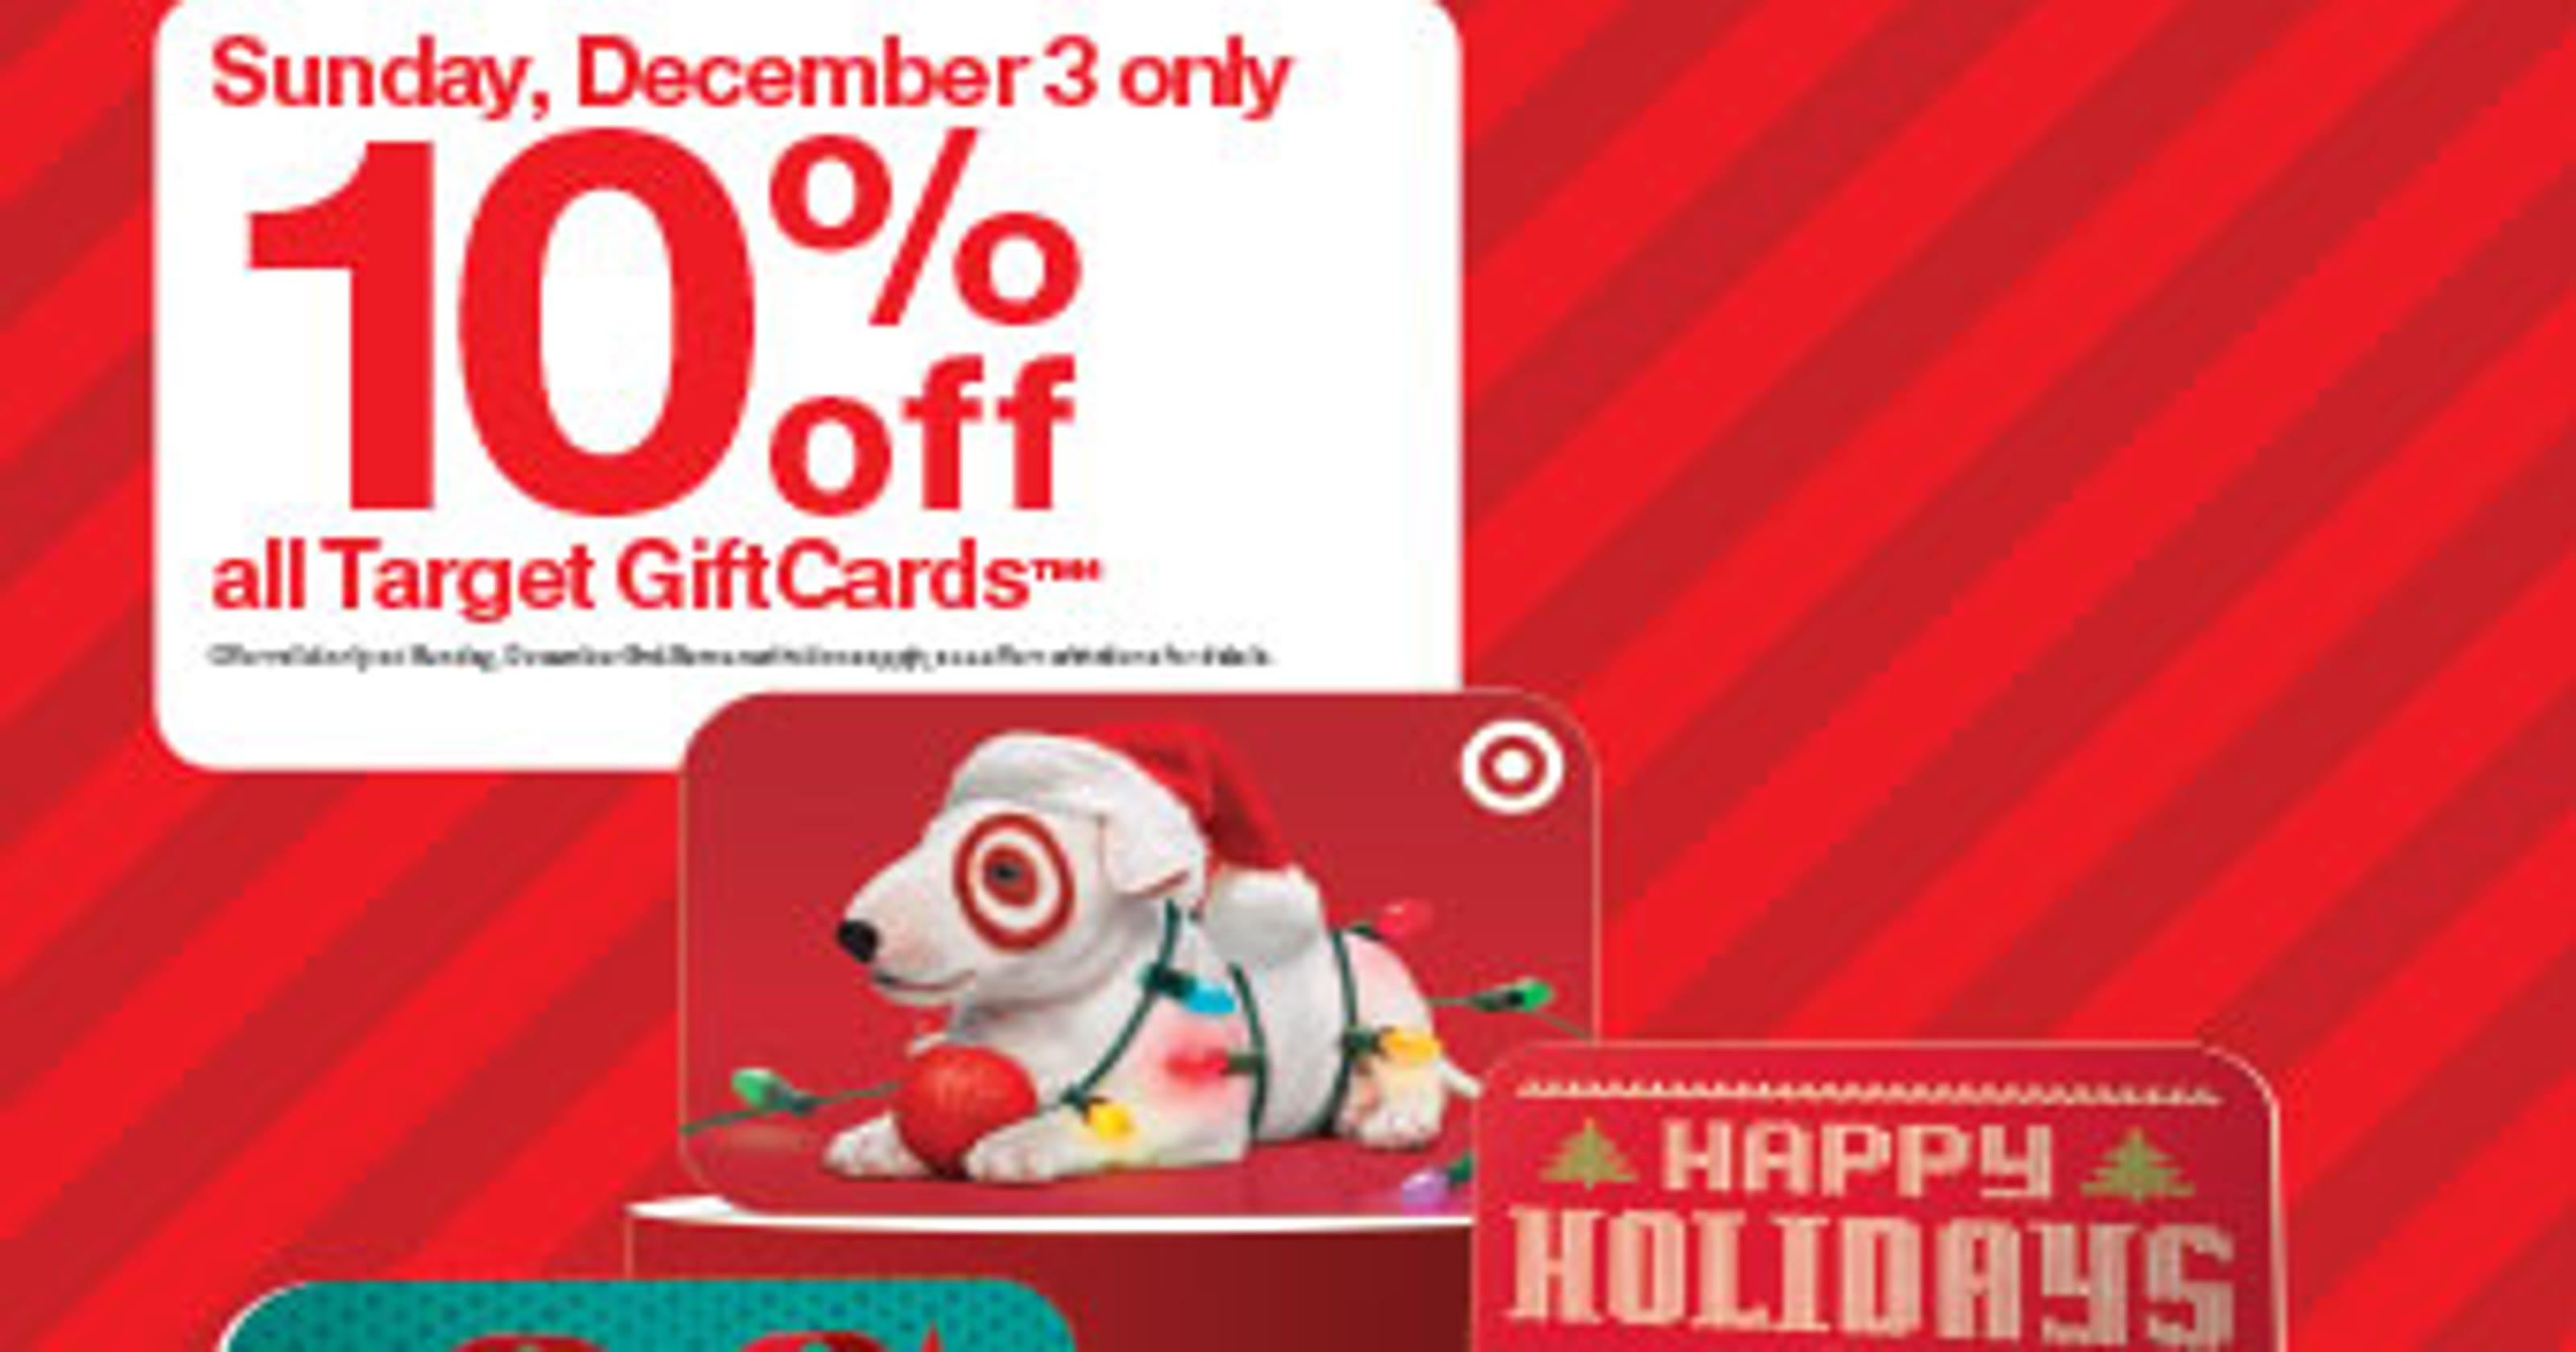 Savings alert: Don\'t miss Target\'s rare gift card sale Dec. 3